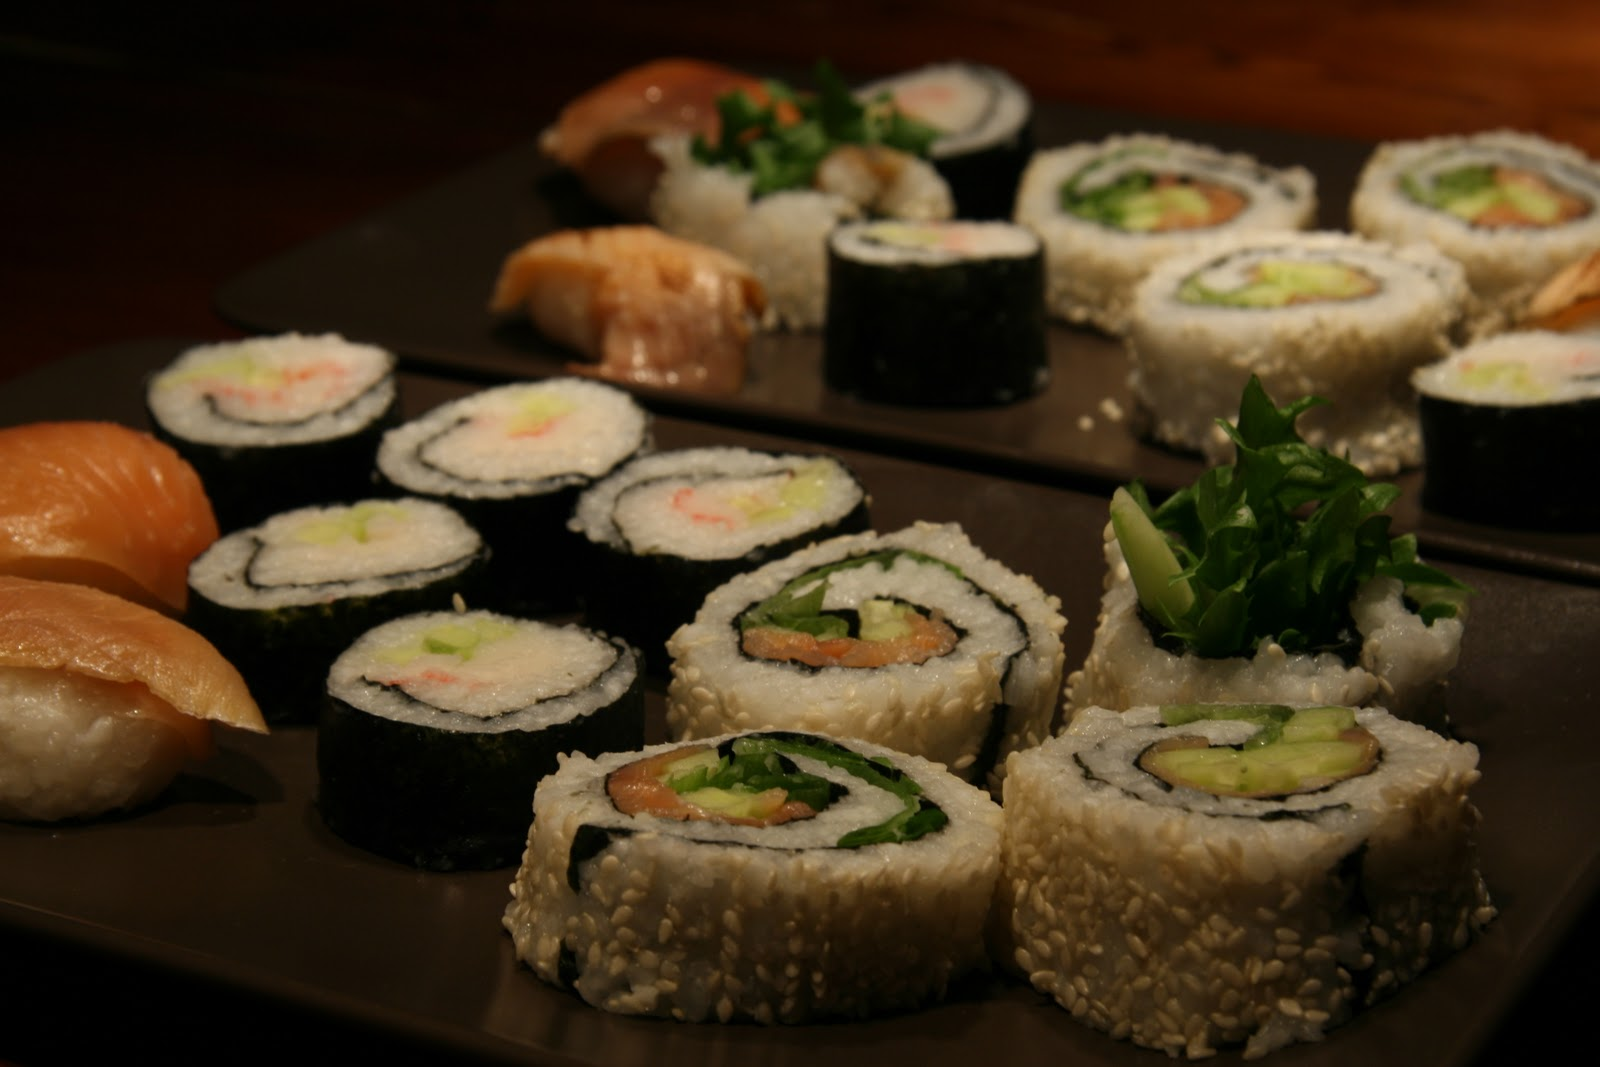 lepatriin lendab mulle ei maitse sushi. Black Bedroom Furniture Sets. Home Design Ideas